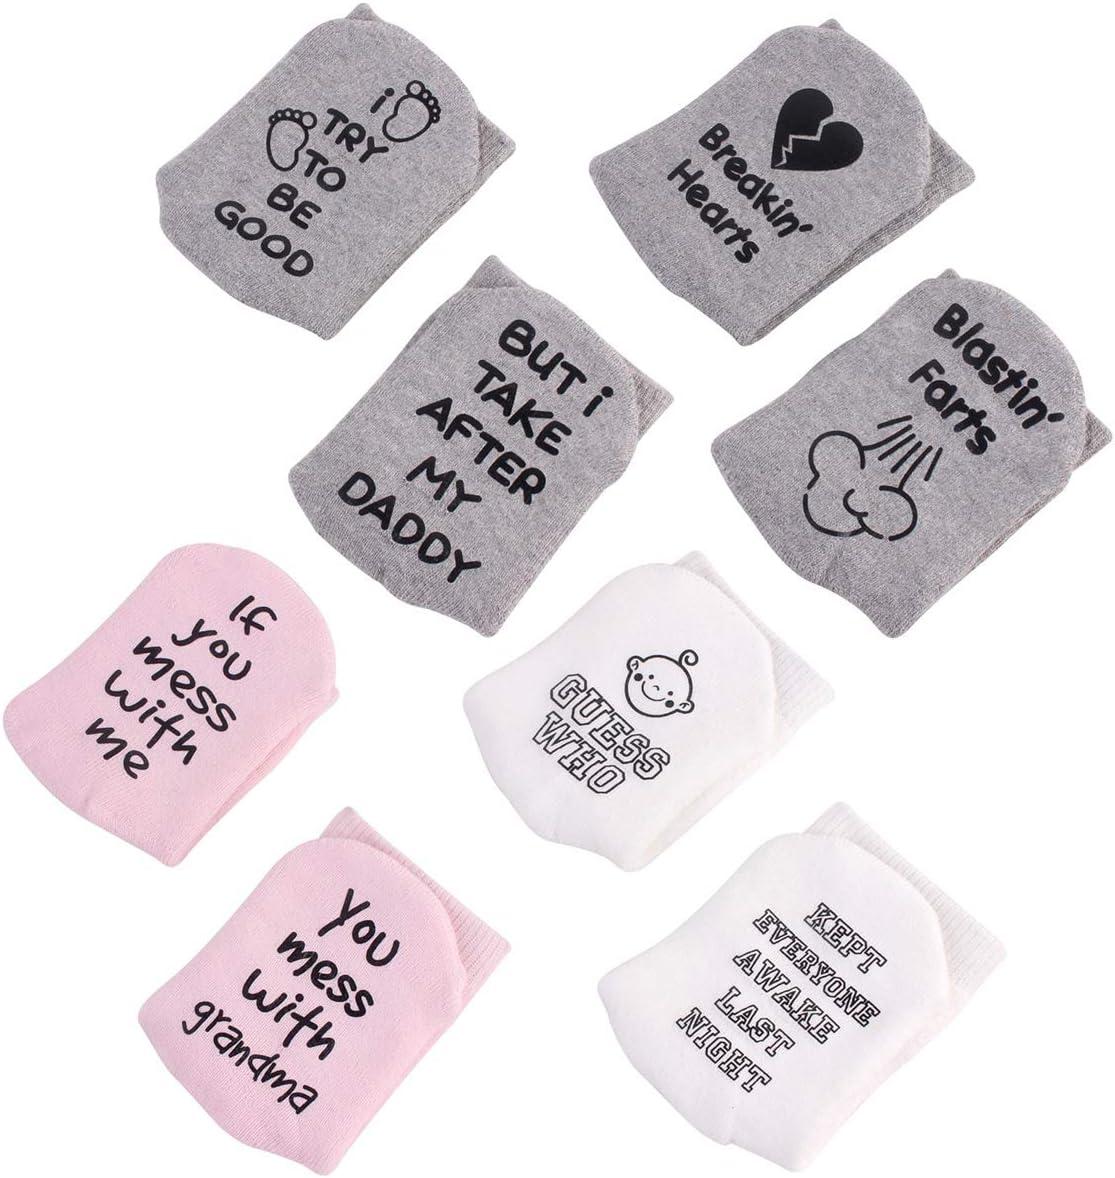 Owlike 4 Pairs Anti-Skid Cute Baby Socks Gift Set,Ankle Socks for Unisex Boy Girl Infant Newborn 0-12 Months